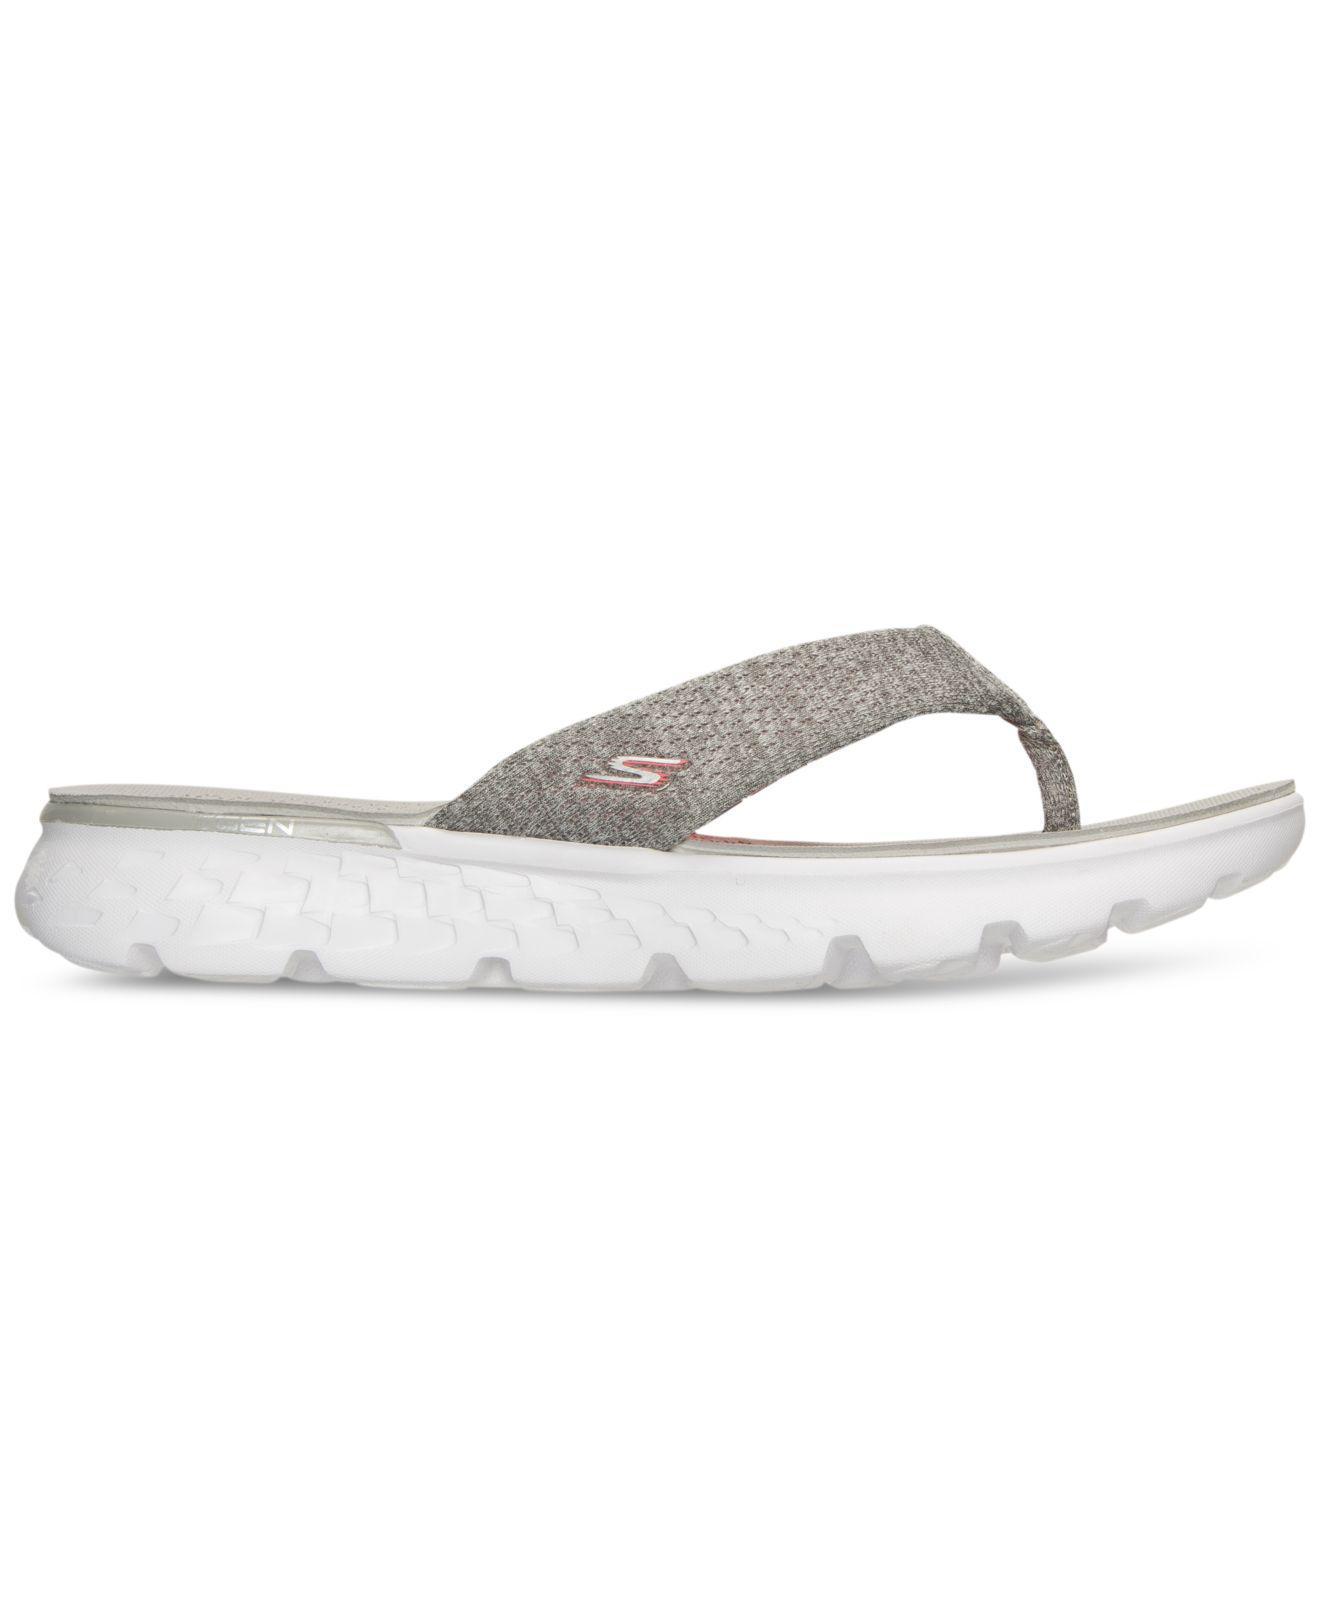 a98fdde5d6 Lyst - Skechers Women's On The Go - Vivacity Flip Flop Thong Sandals ...